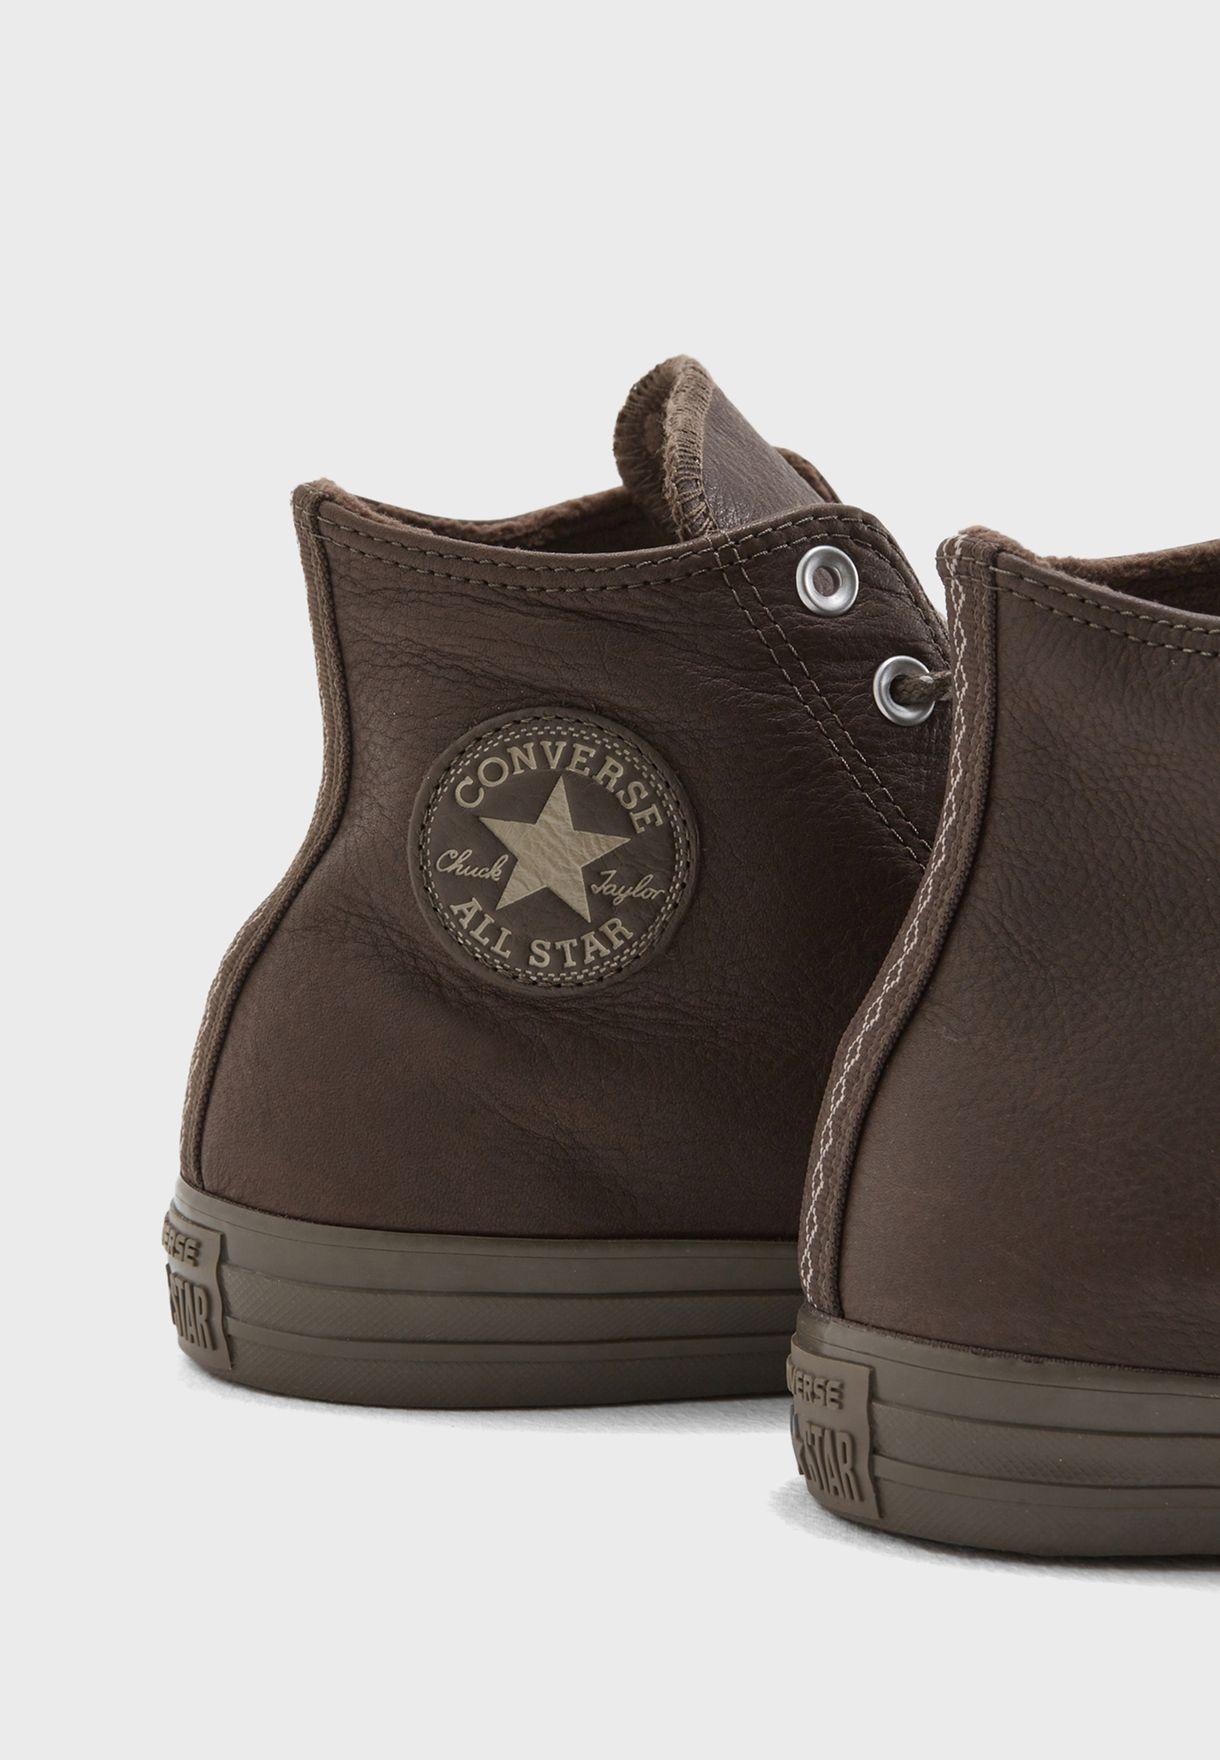 75950a35560e Shop Converse browns Chuck Taylor All Star CN157513C-210 for ...